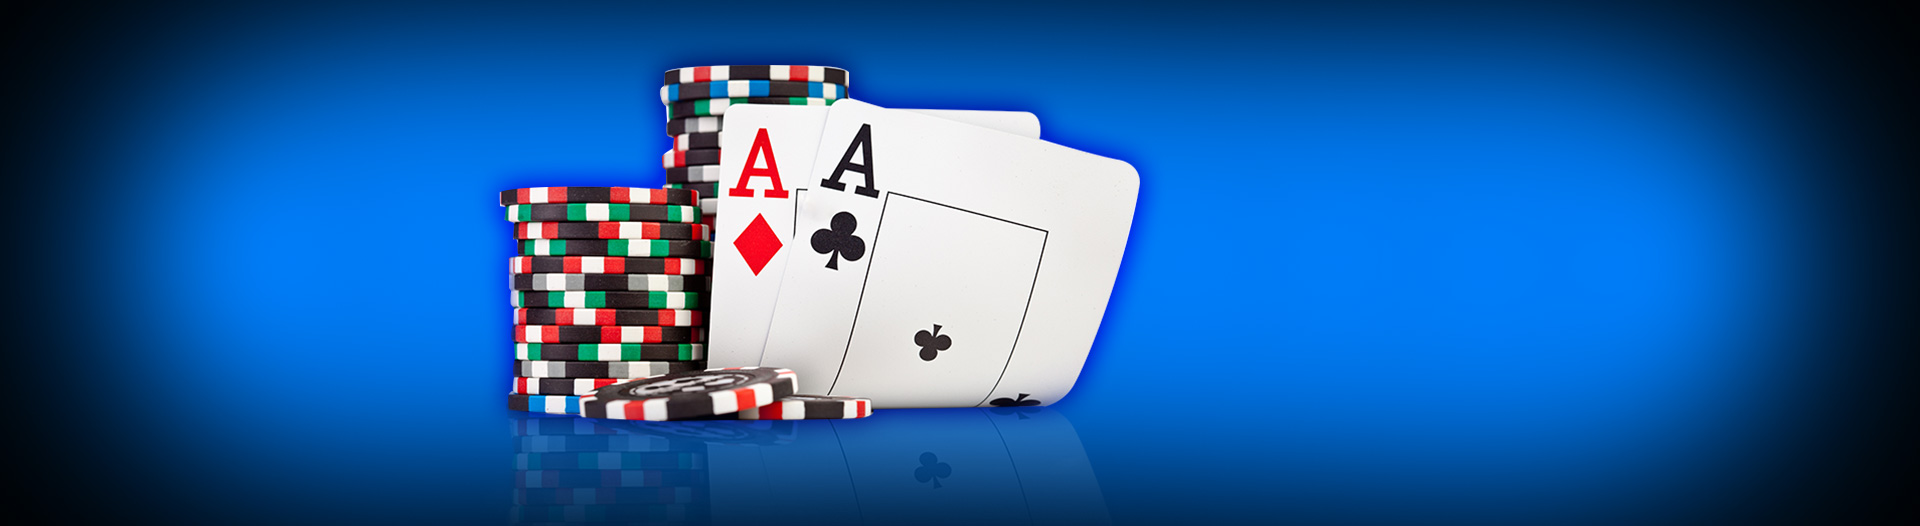 Casino con bitcoins 888 poker Juárez-155353